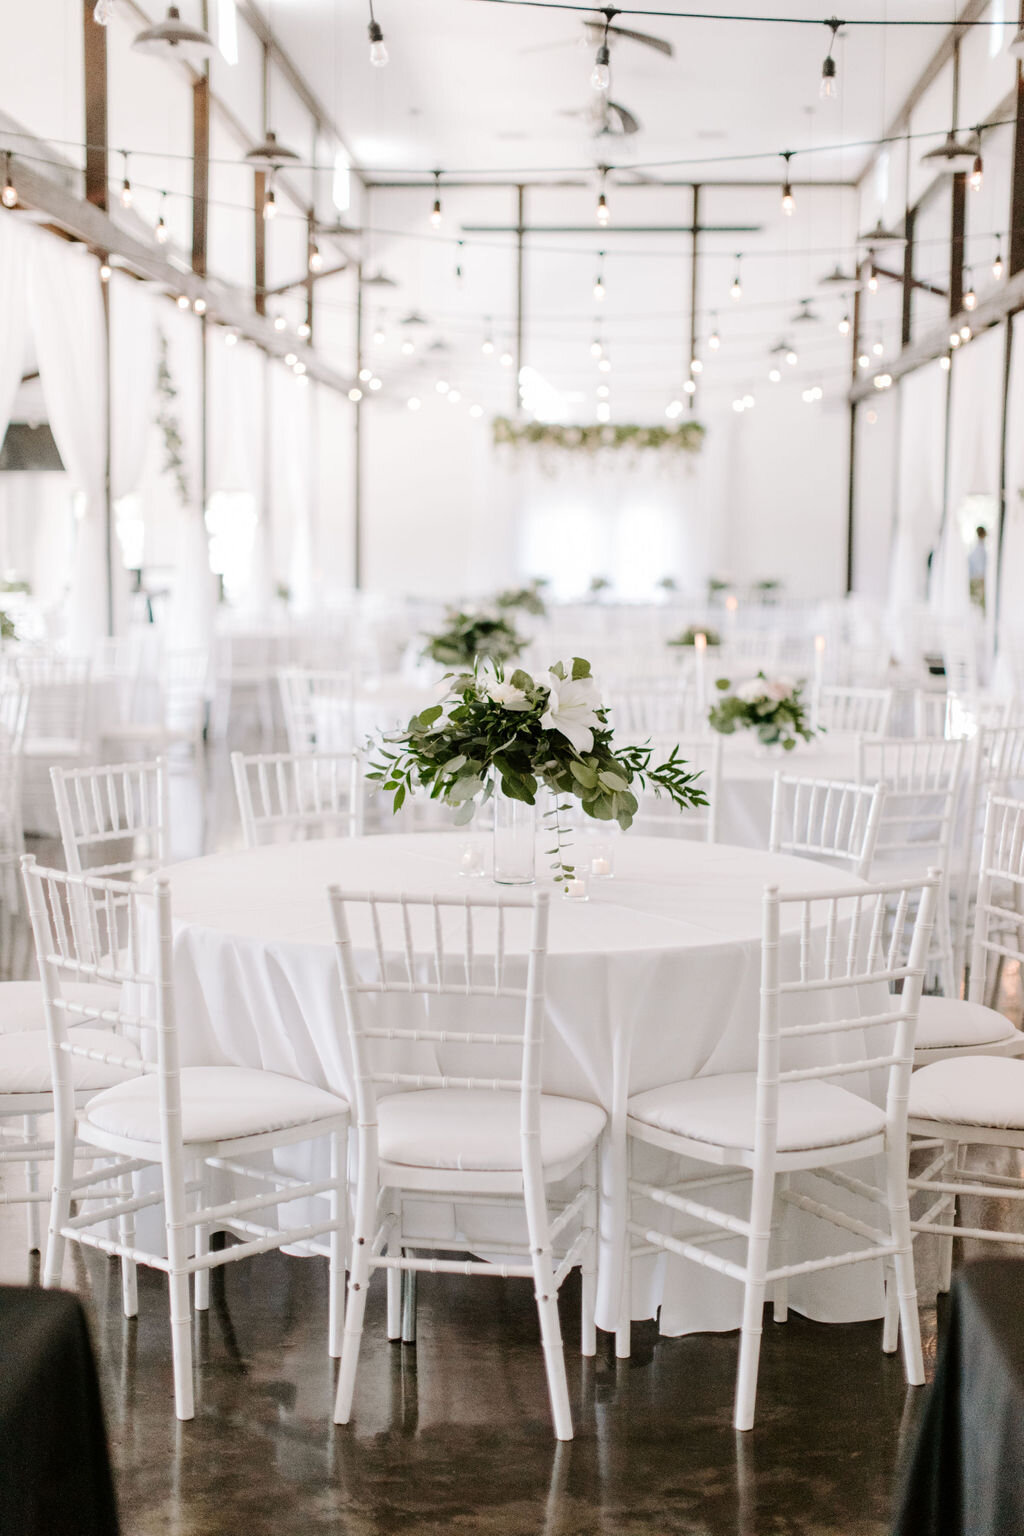 Tulsa White Barn Wedding Venue Outdoor Ceremony 6.JPG